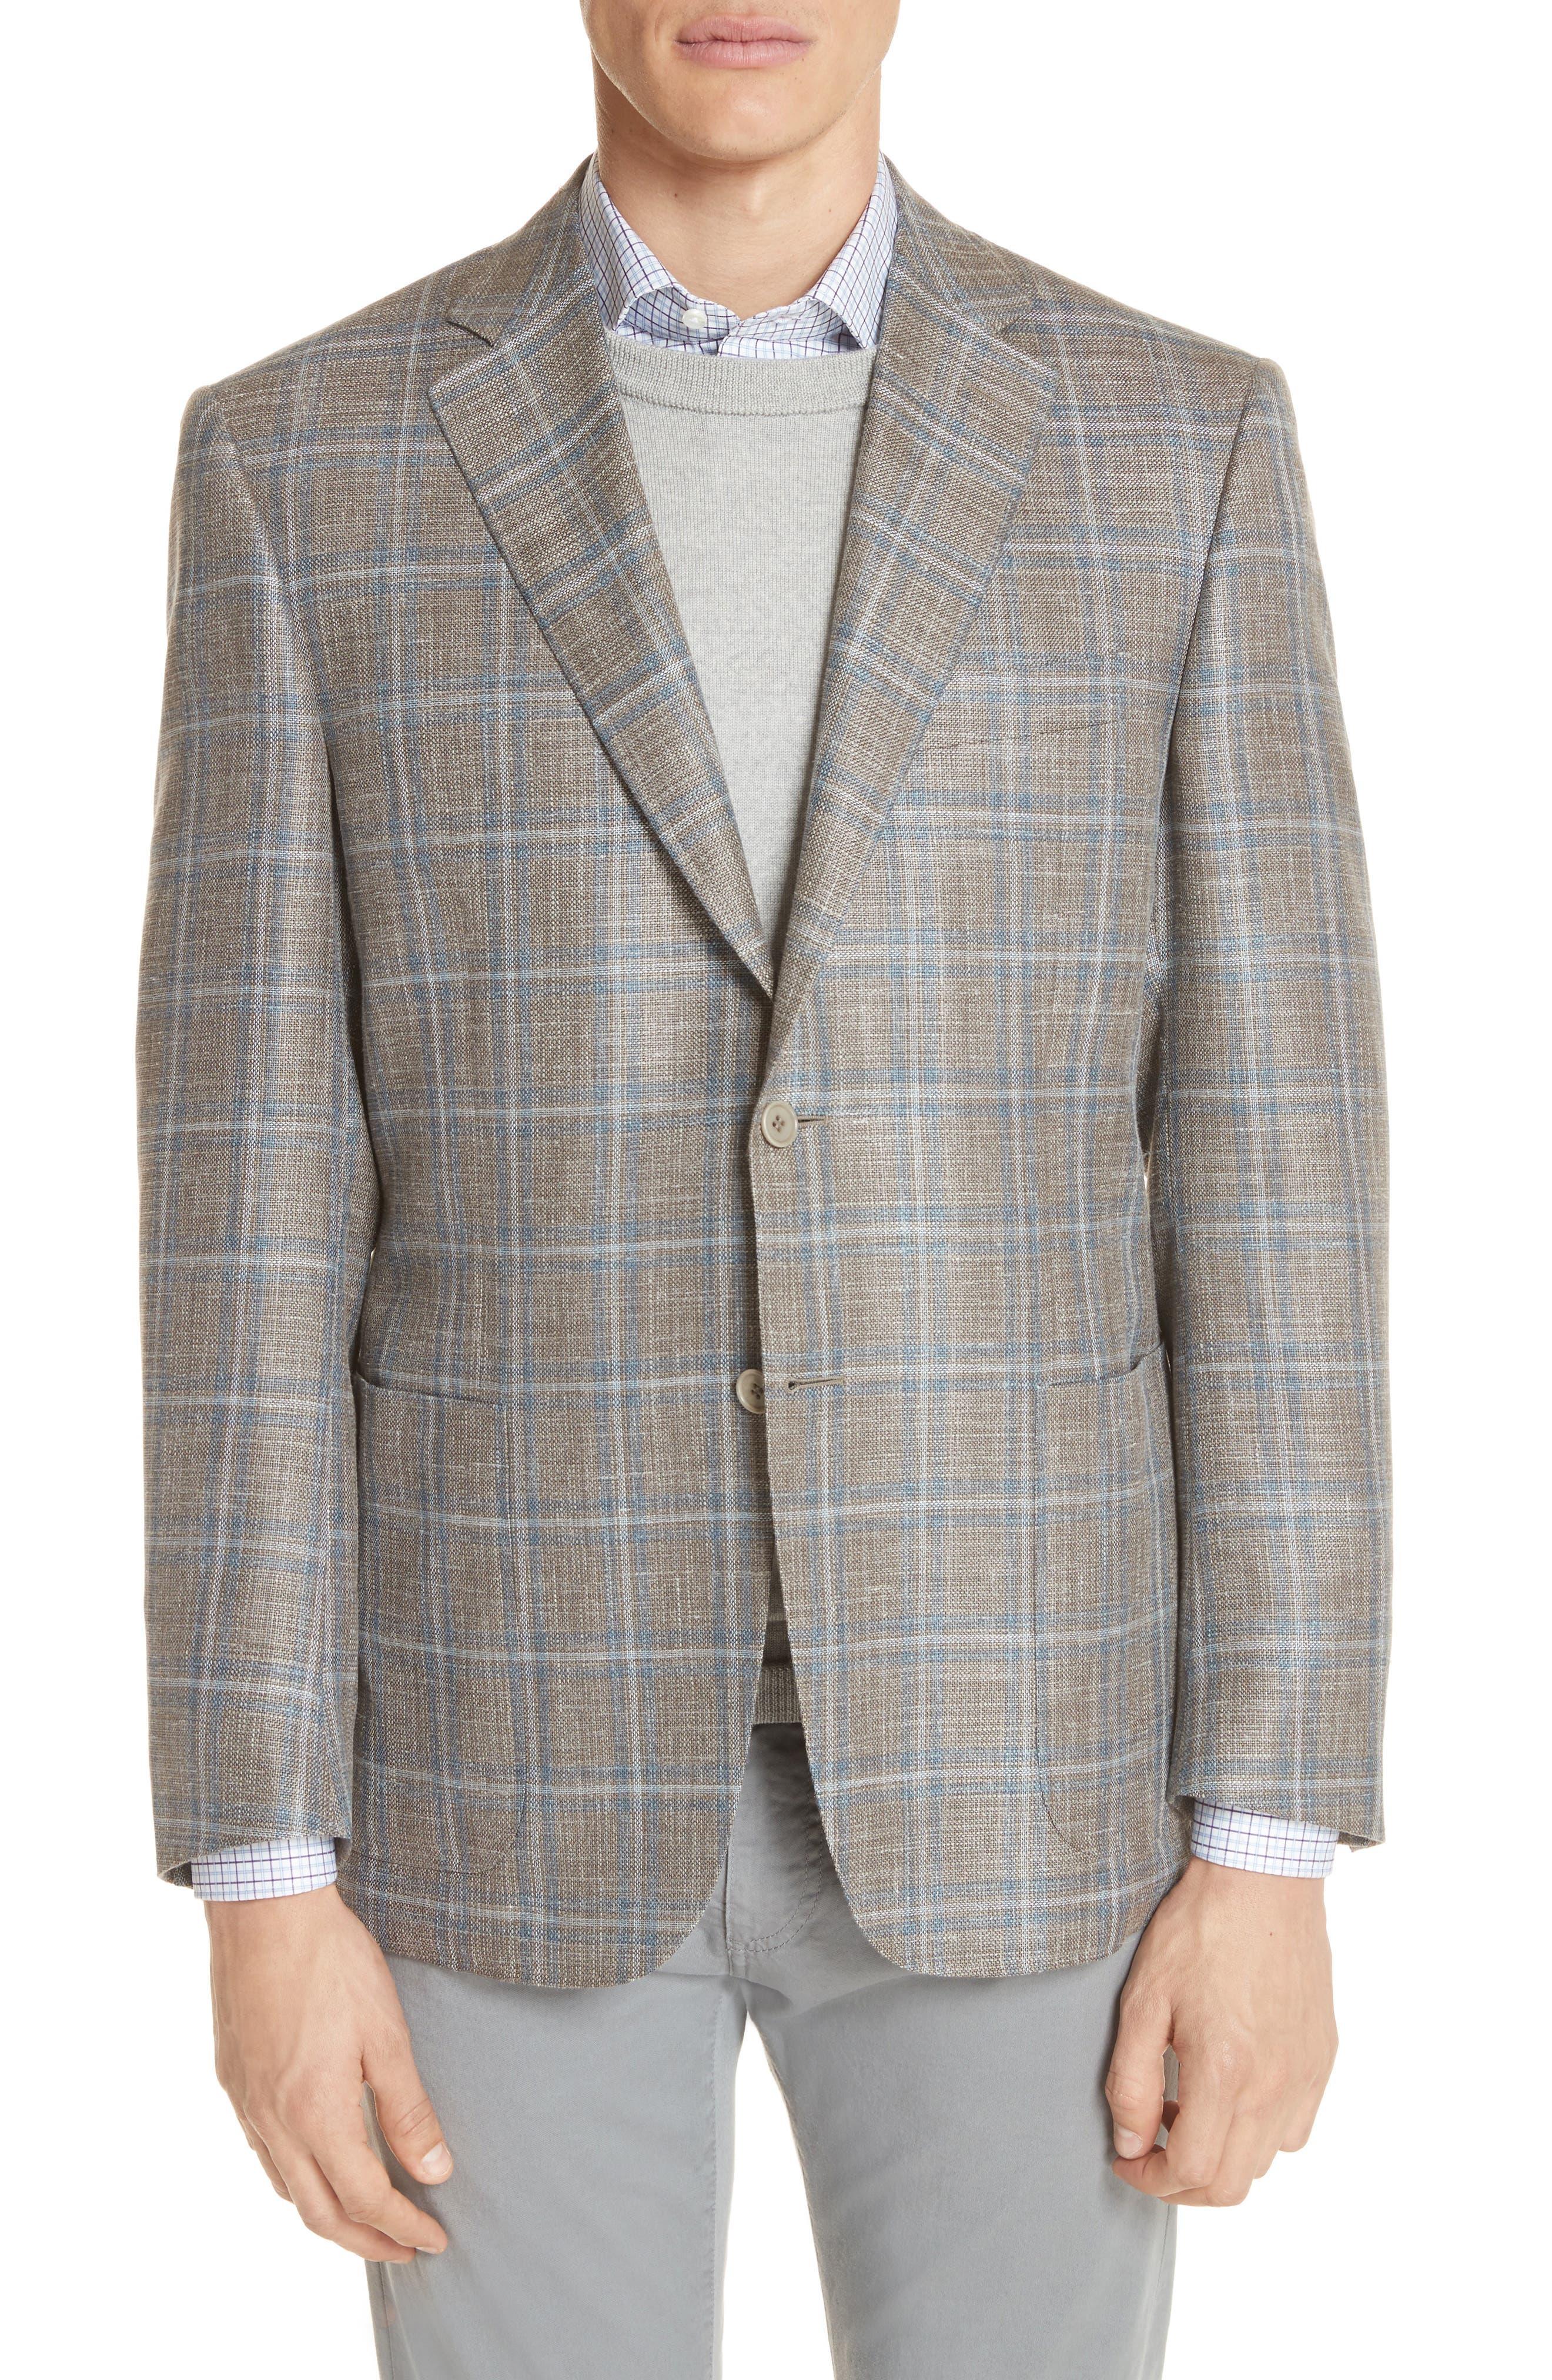 CANALI,                             Kei Classic Fit Windowpane Wool Blend Sport Coat,                             Main thumbnail 1, color,                             250